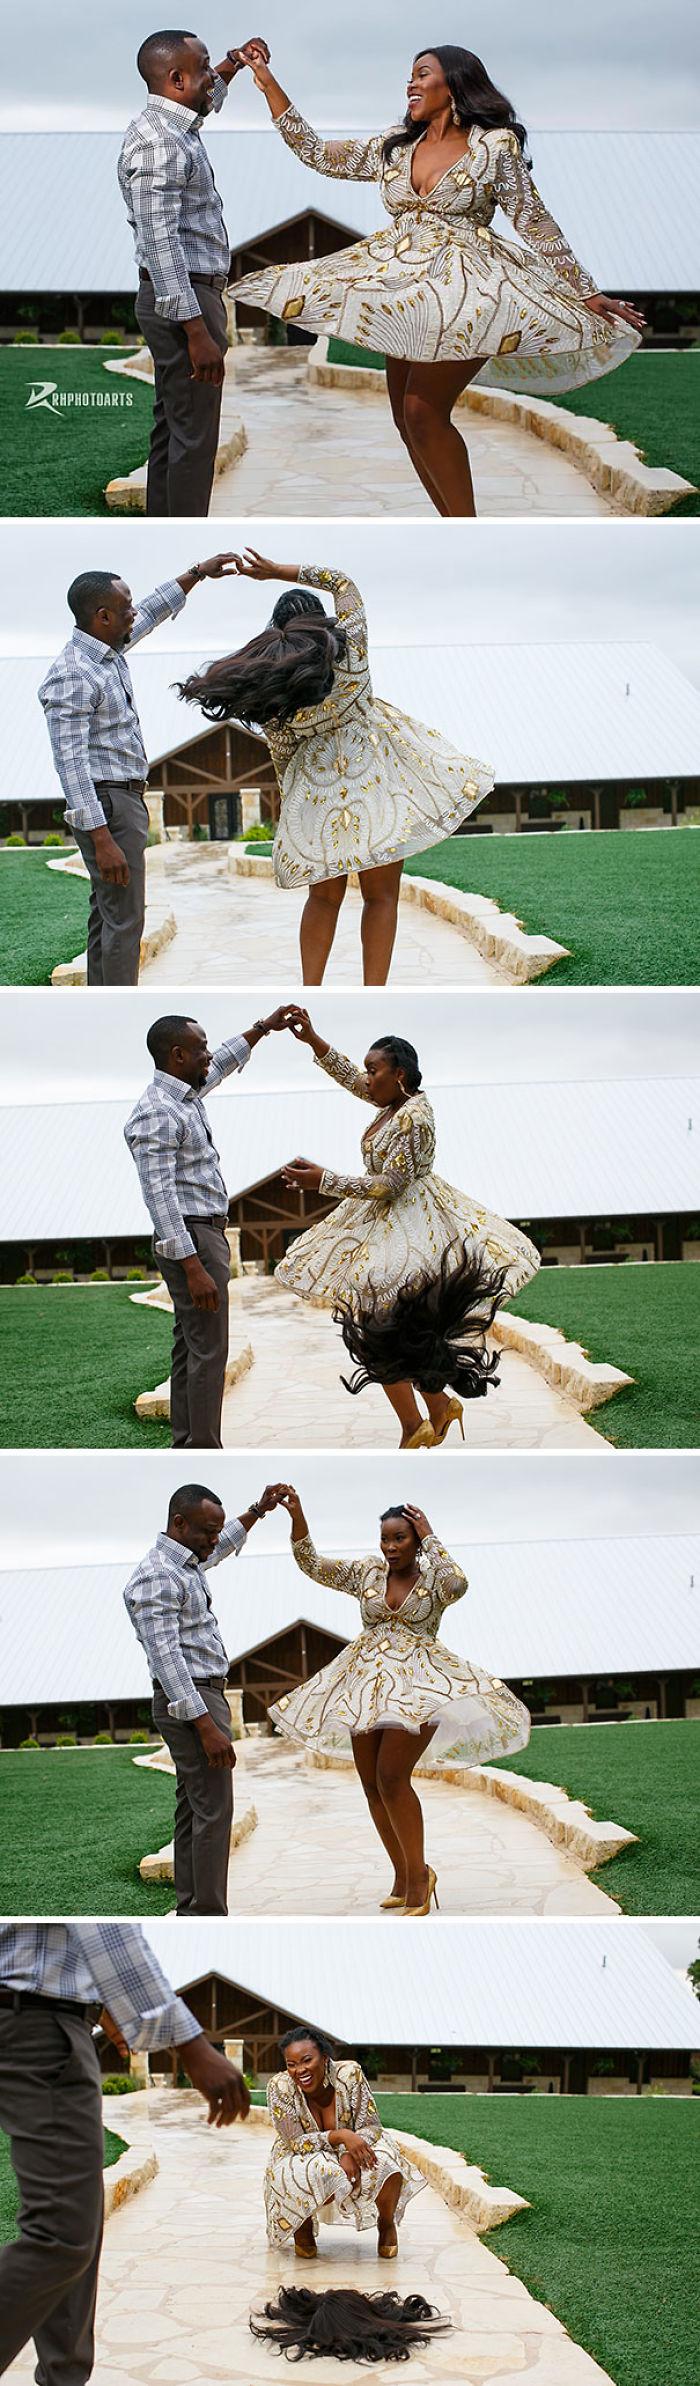 La peluca de la novia se cayó Durante The Engagement Shoot, pero ella era totalmente dueña del momento